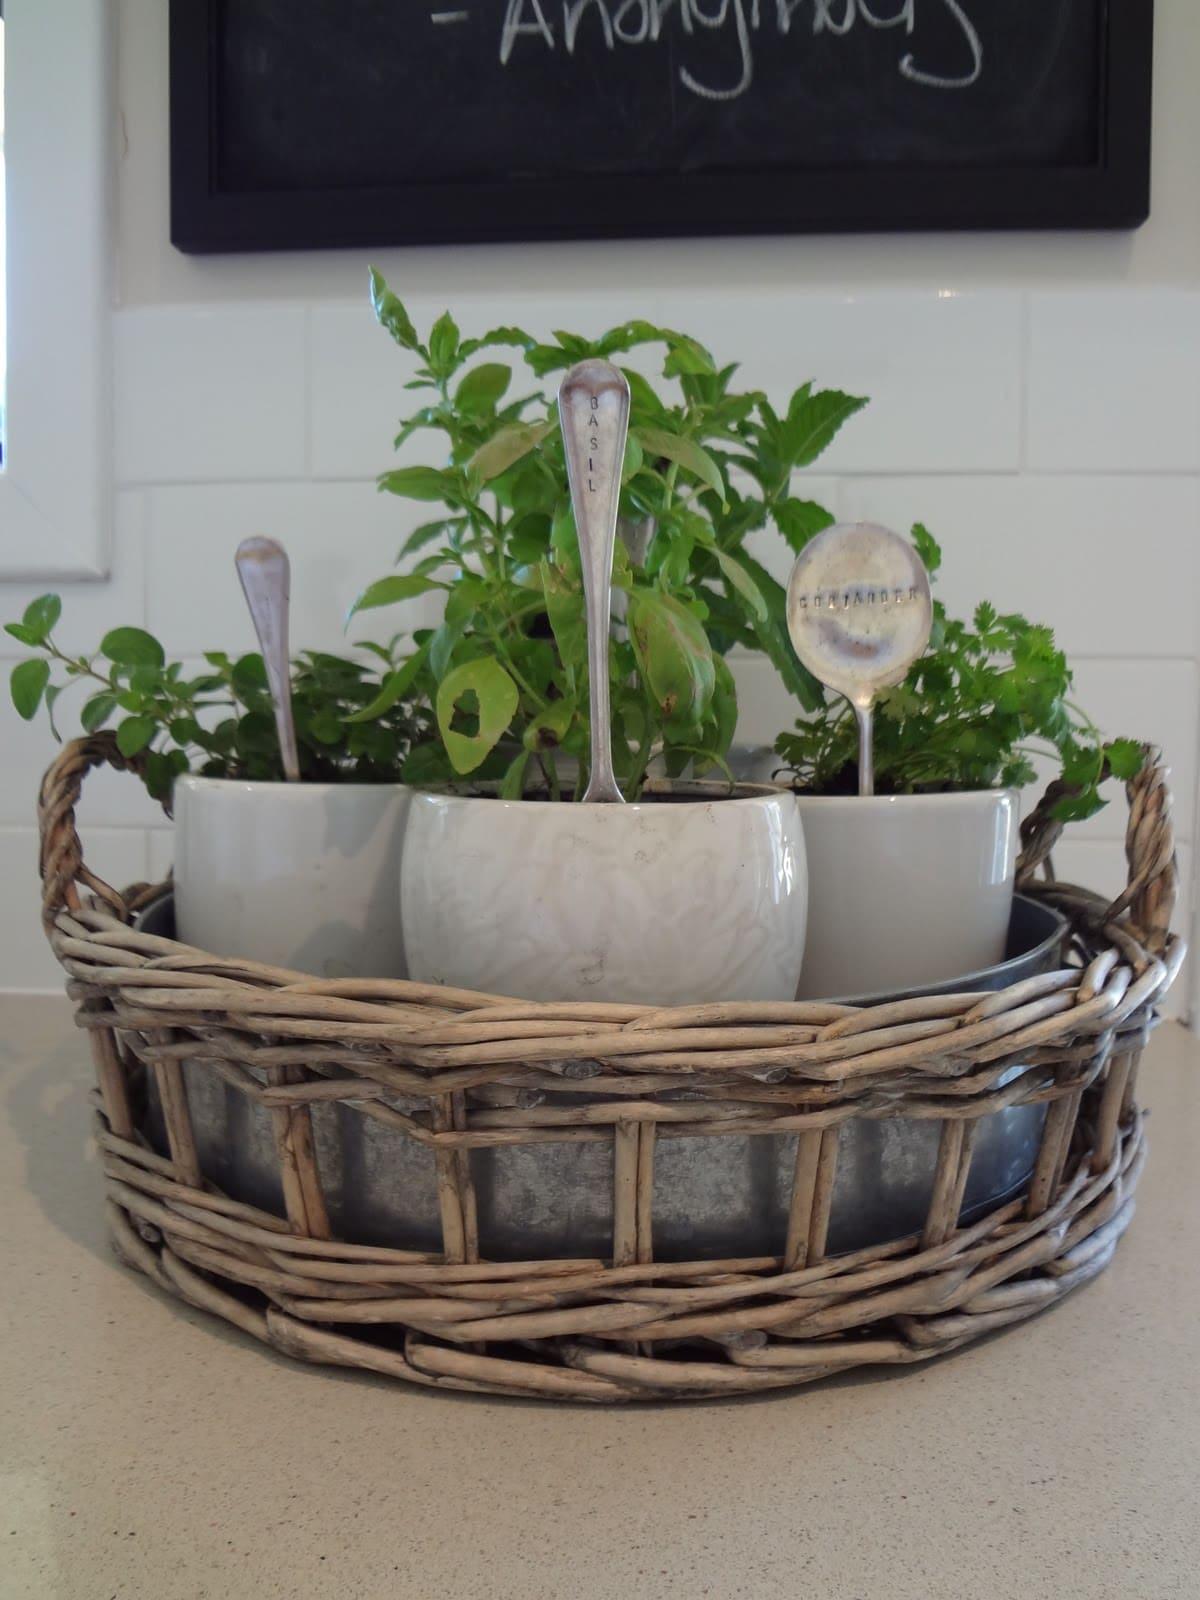 4.Herb Garden in Cups via Simphome.com